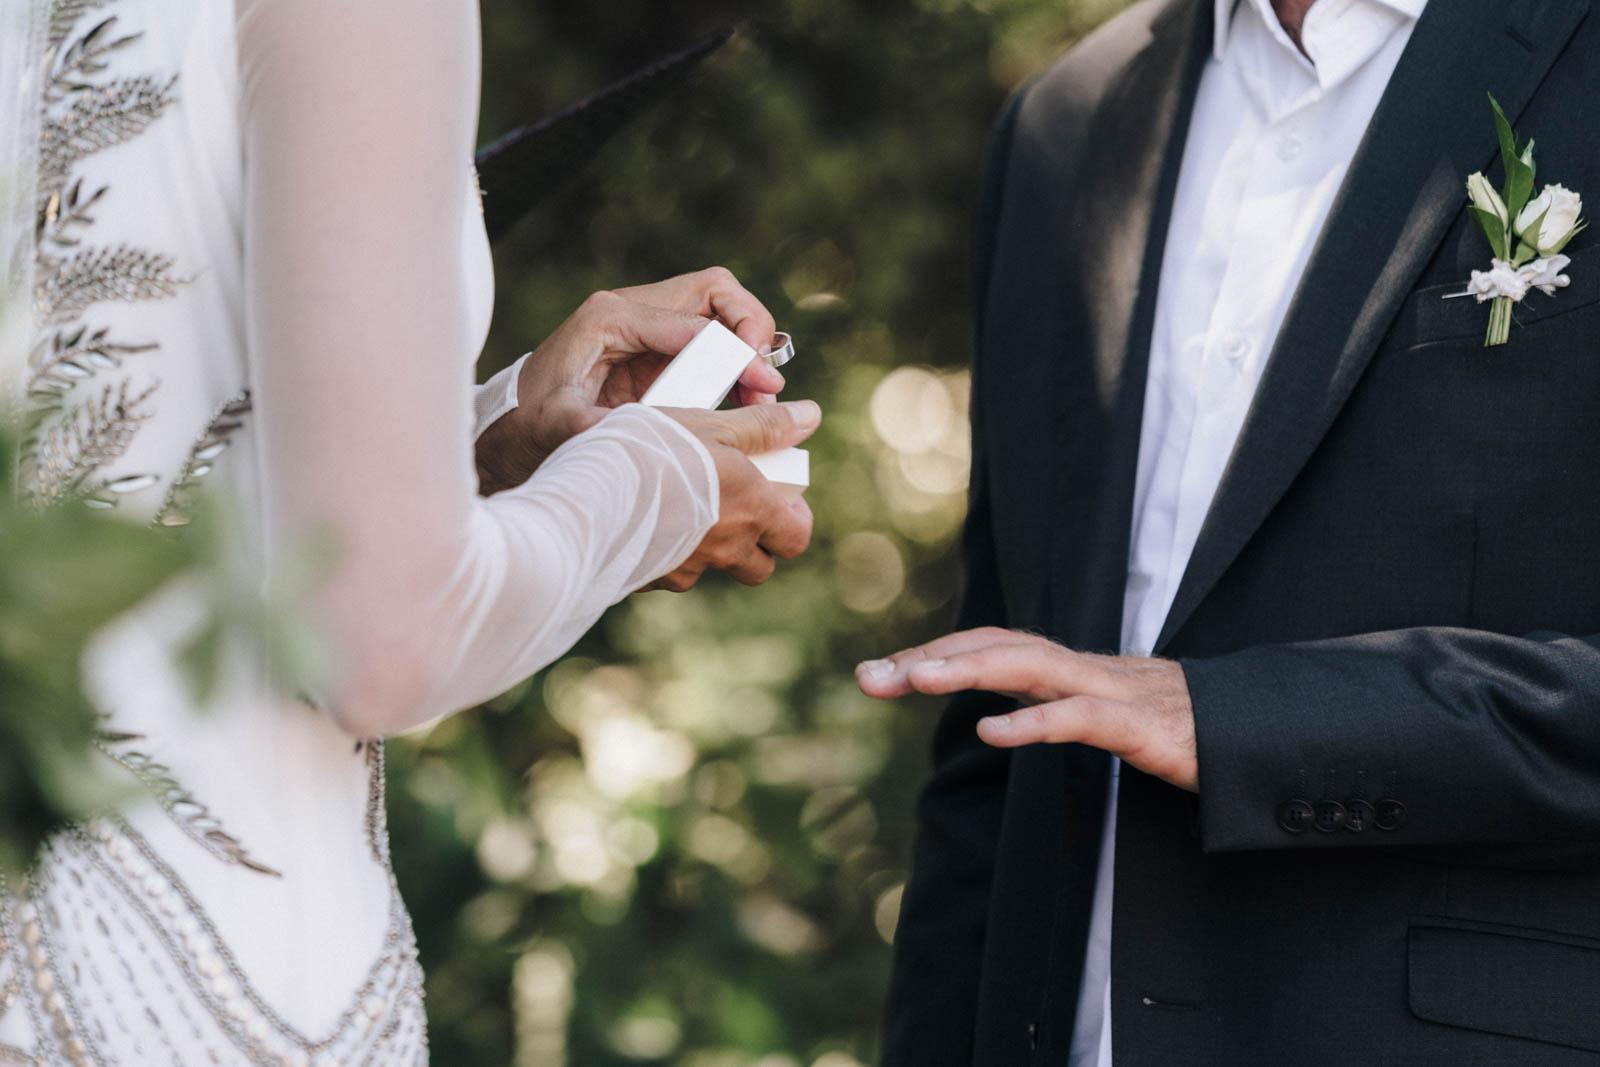 newfound-l-i-coromandel-wedding-photographer-1615-A9_03062